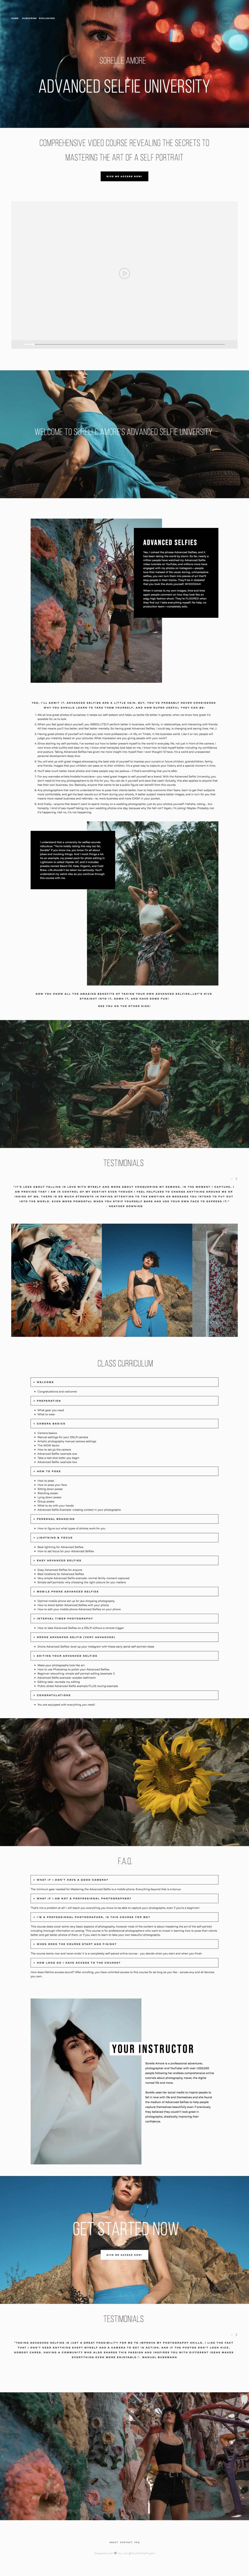 batchLine De Vos - screencapture-sorelle-amore-university-squarespace-2019-02-19-13_09_06.jpg